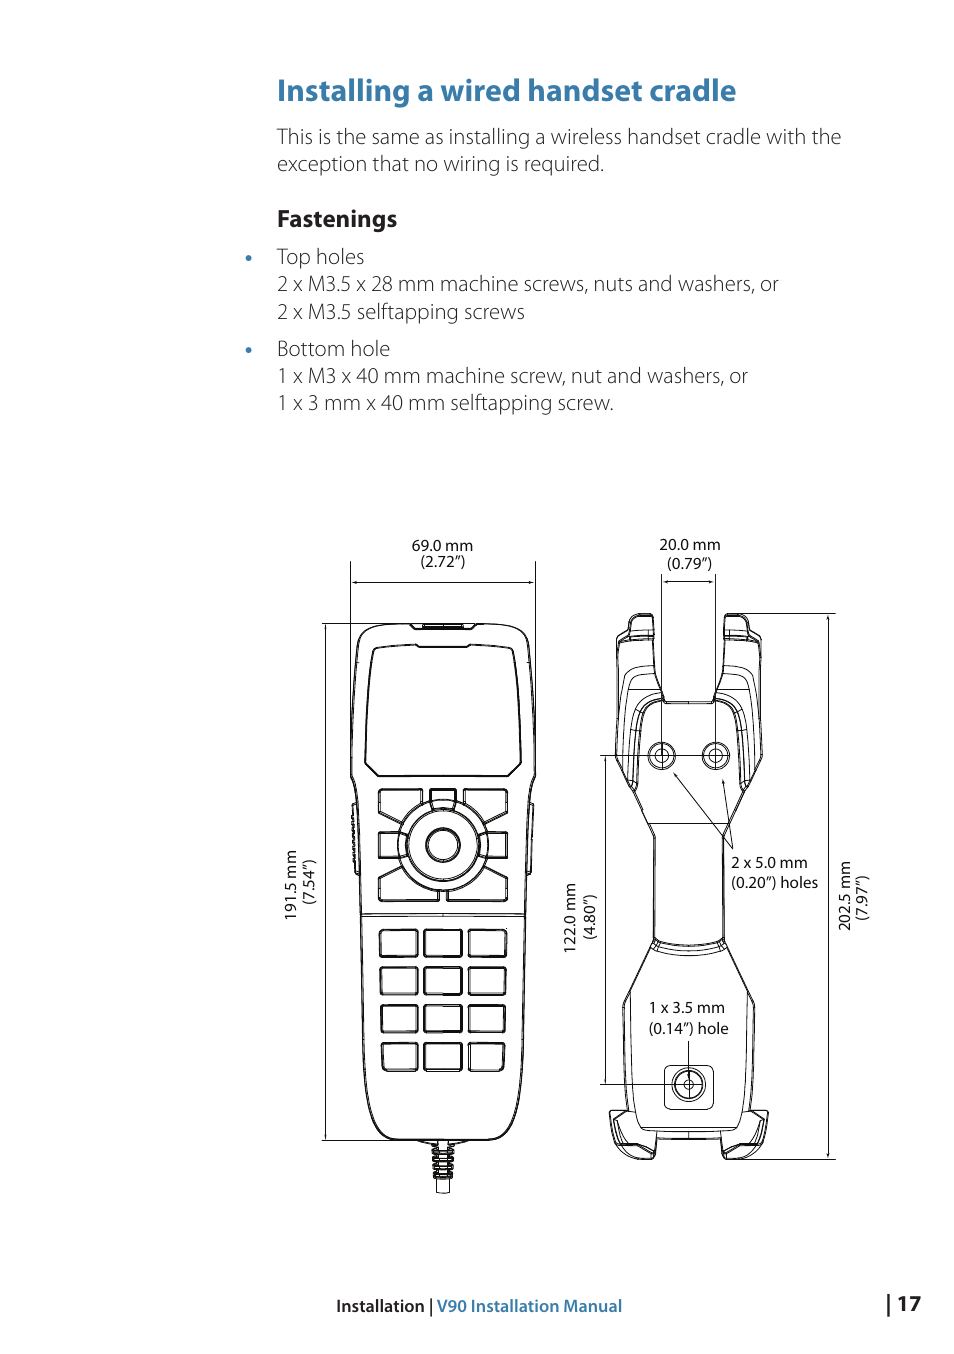 medium resolution of installing a wired handset cradle fastenings b g v90 vhf radio user manual page 17 29